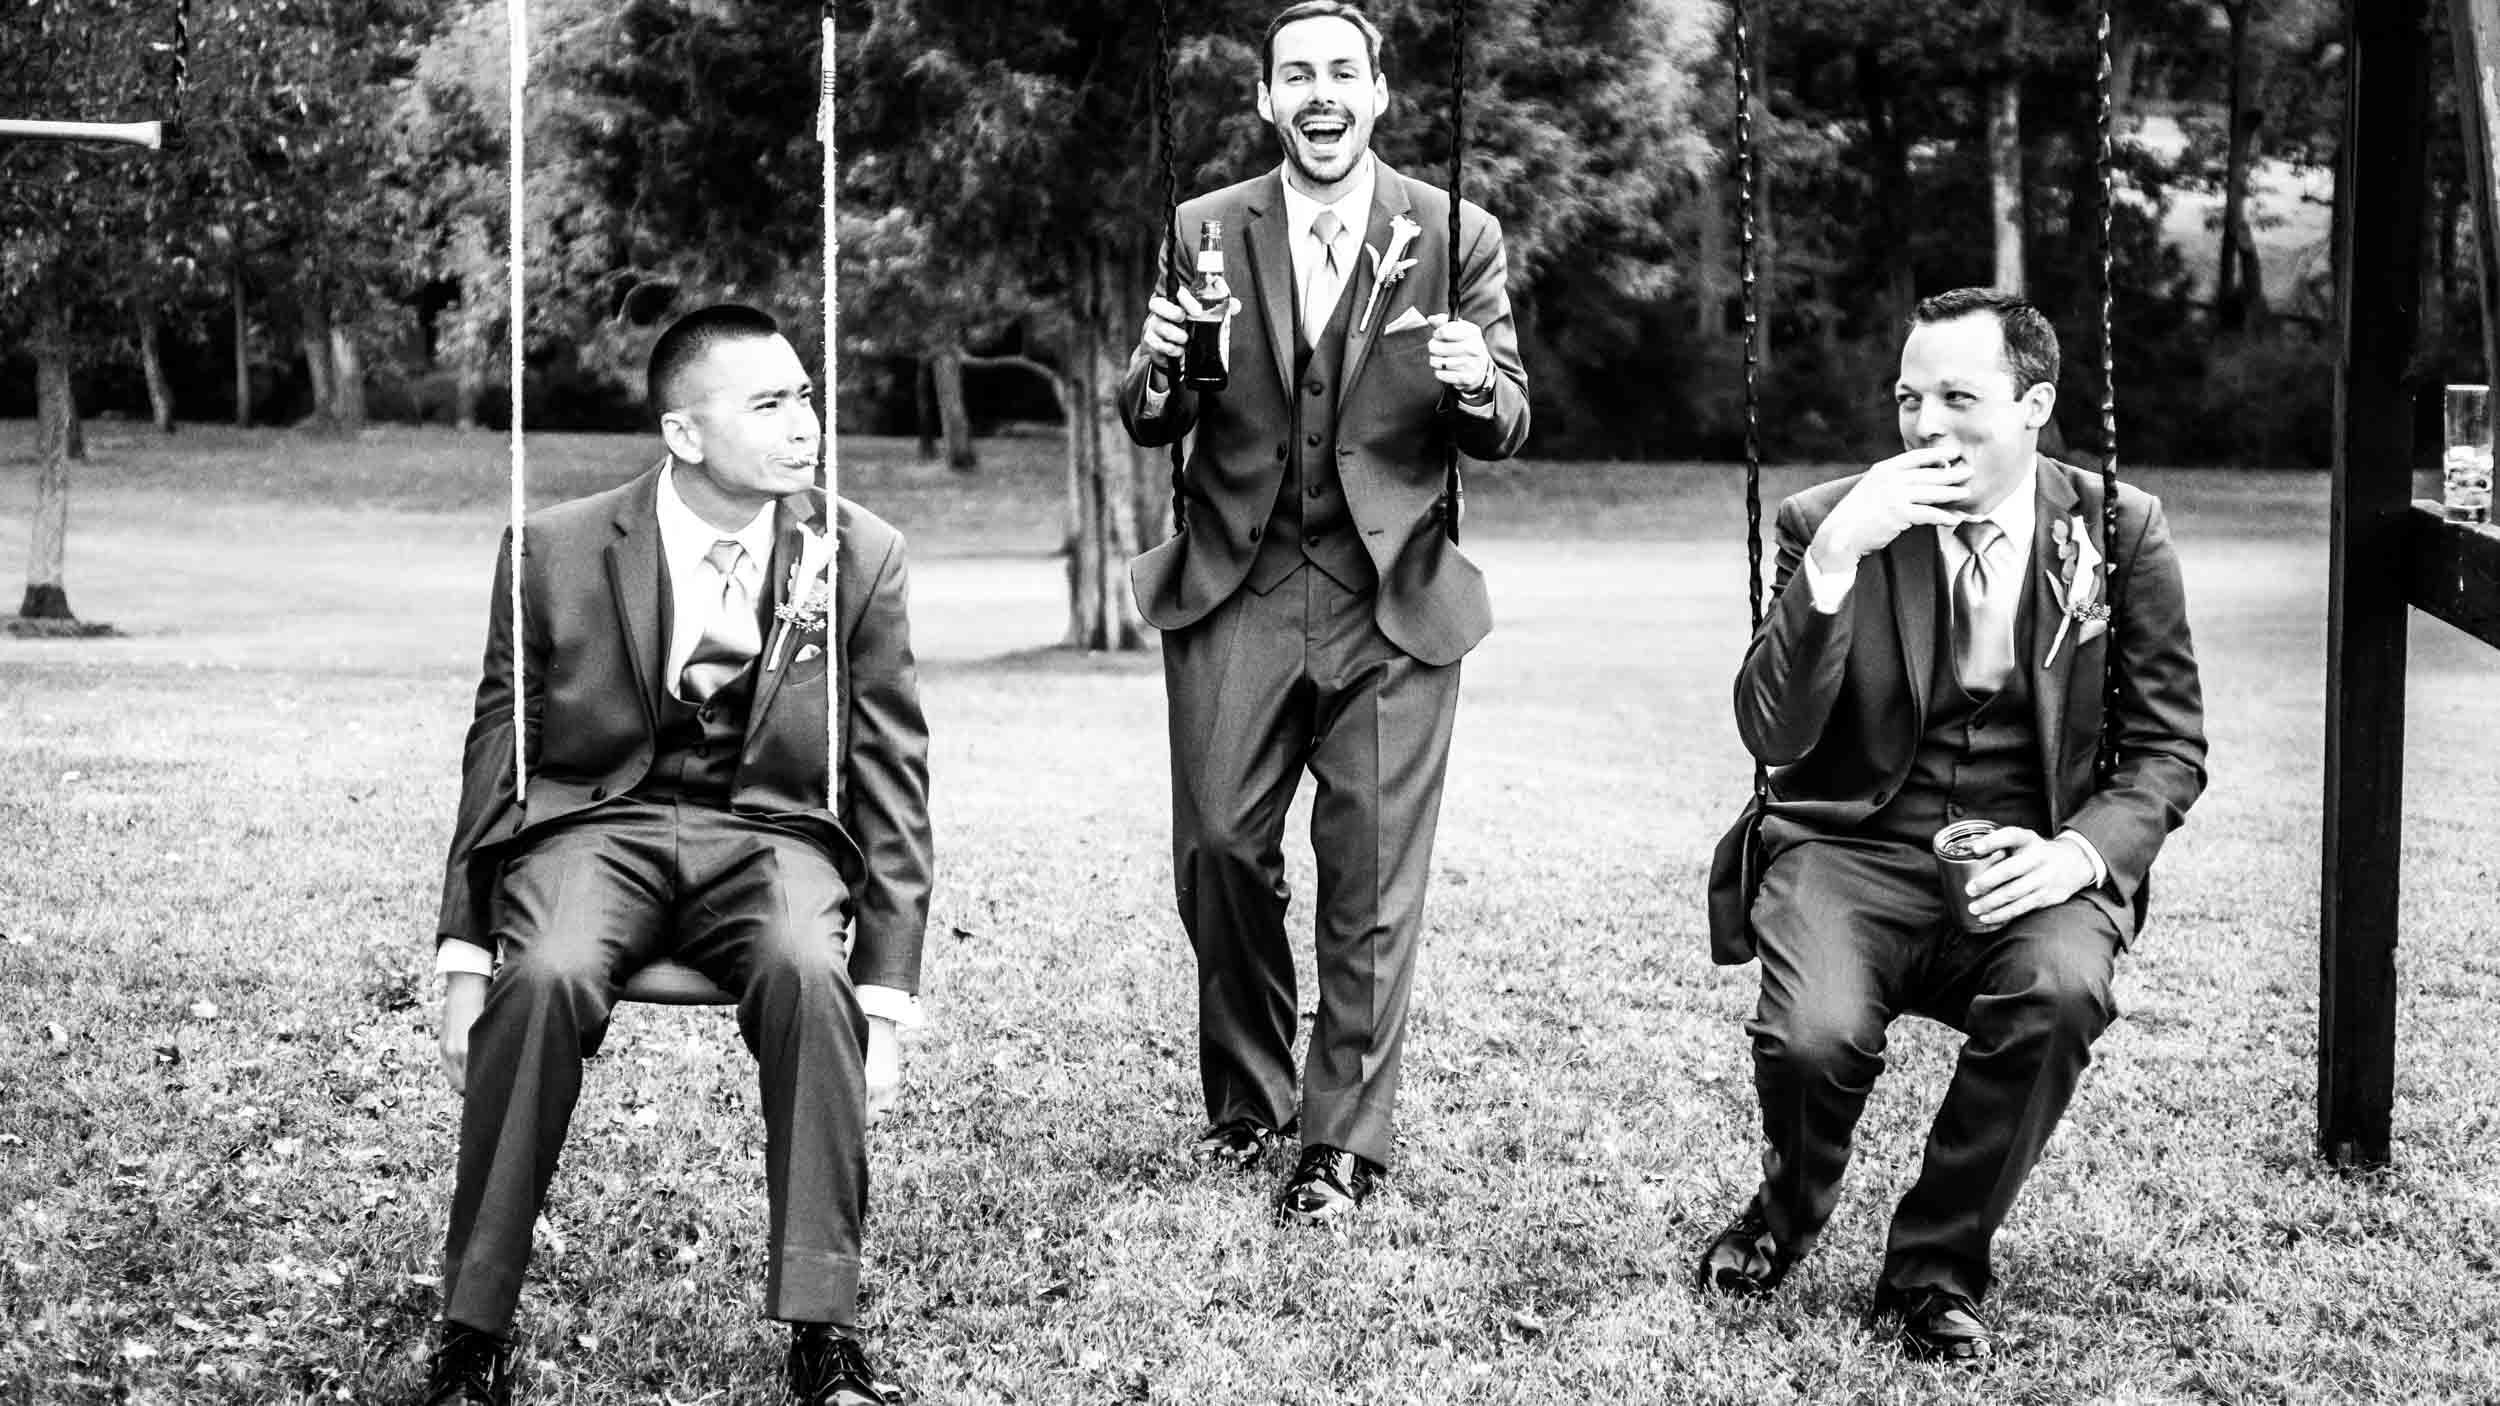 dc+metro+wedding+photographer+vadym+guliuk+photography+weddings+groomsmen-2025.jpg